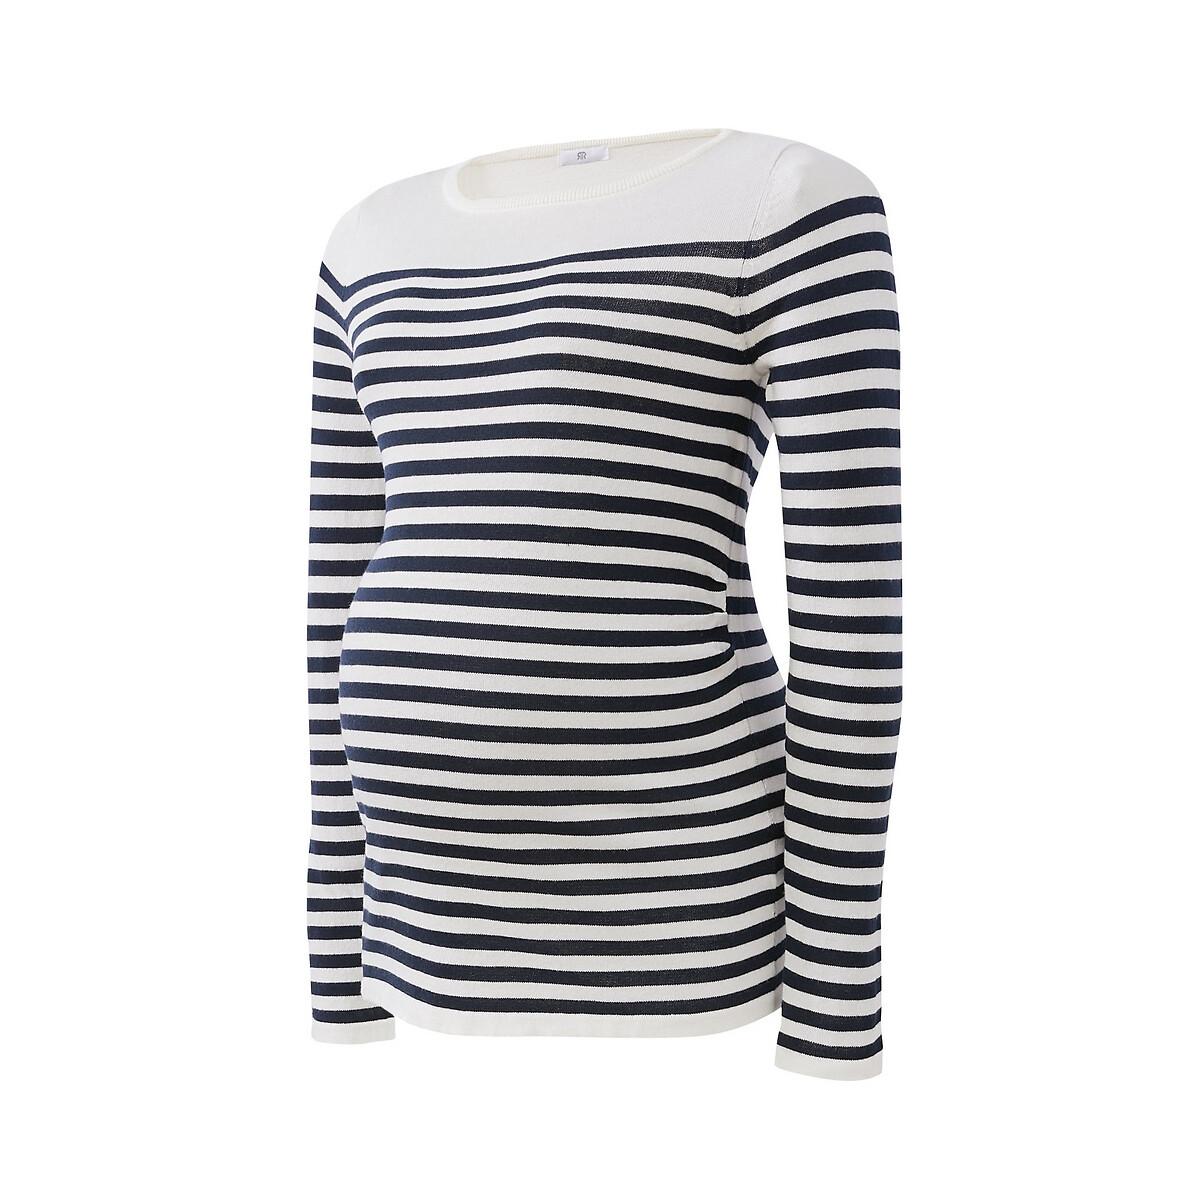 Jersey de embarazo con cuello barco de punto fino a rayas